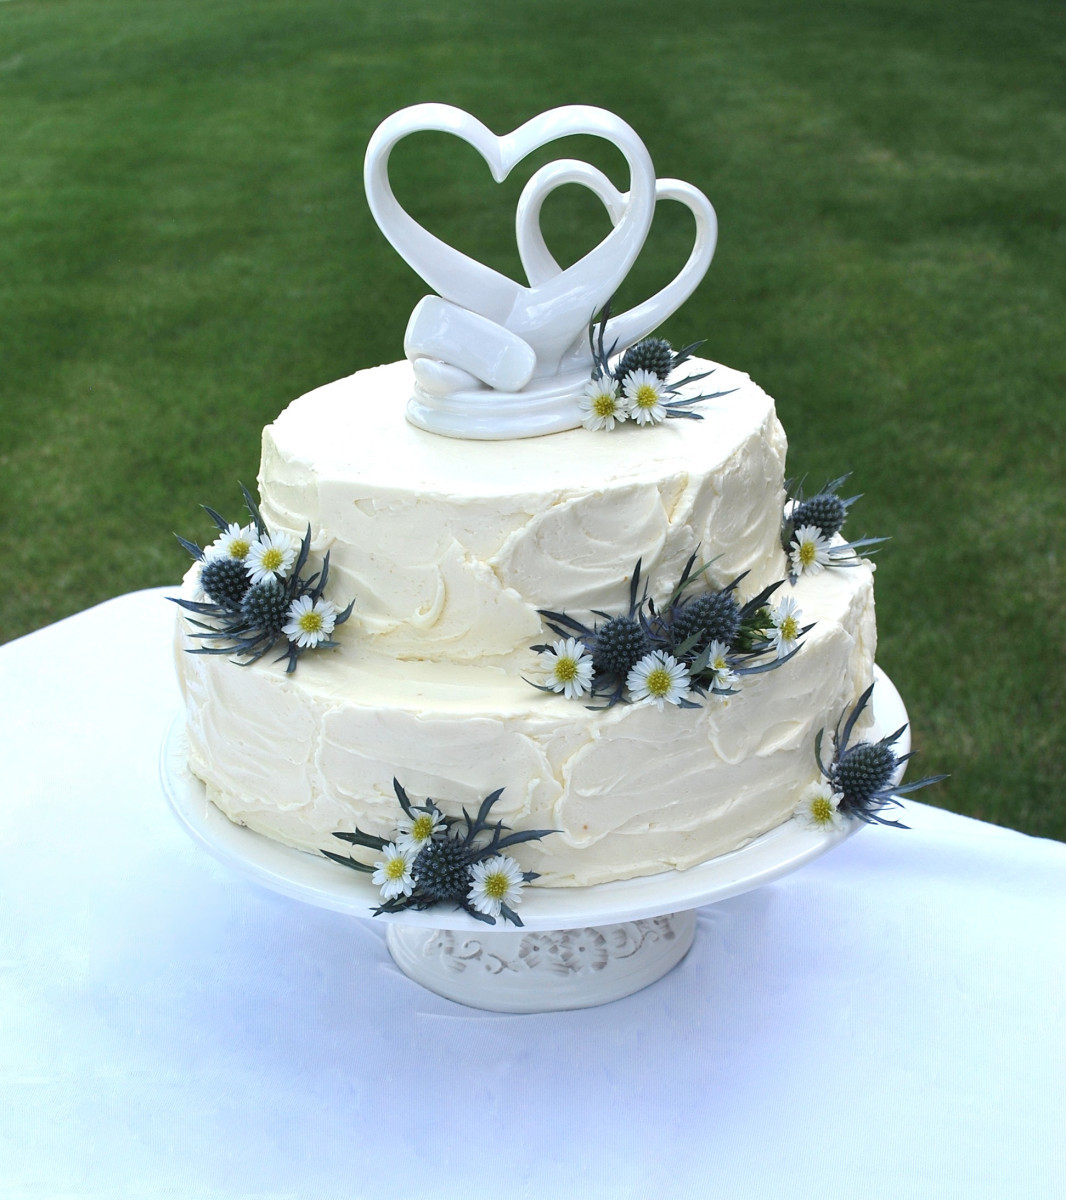 Gluten Free Wedding Cakes  Paleo Wedding Cake gluten free grain free dairy free